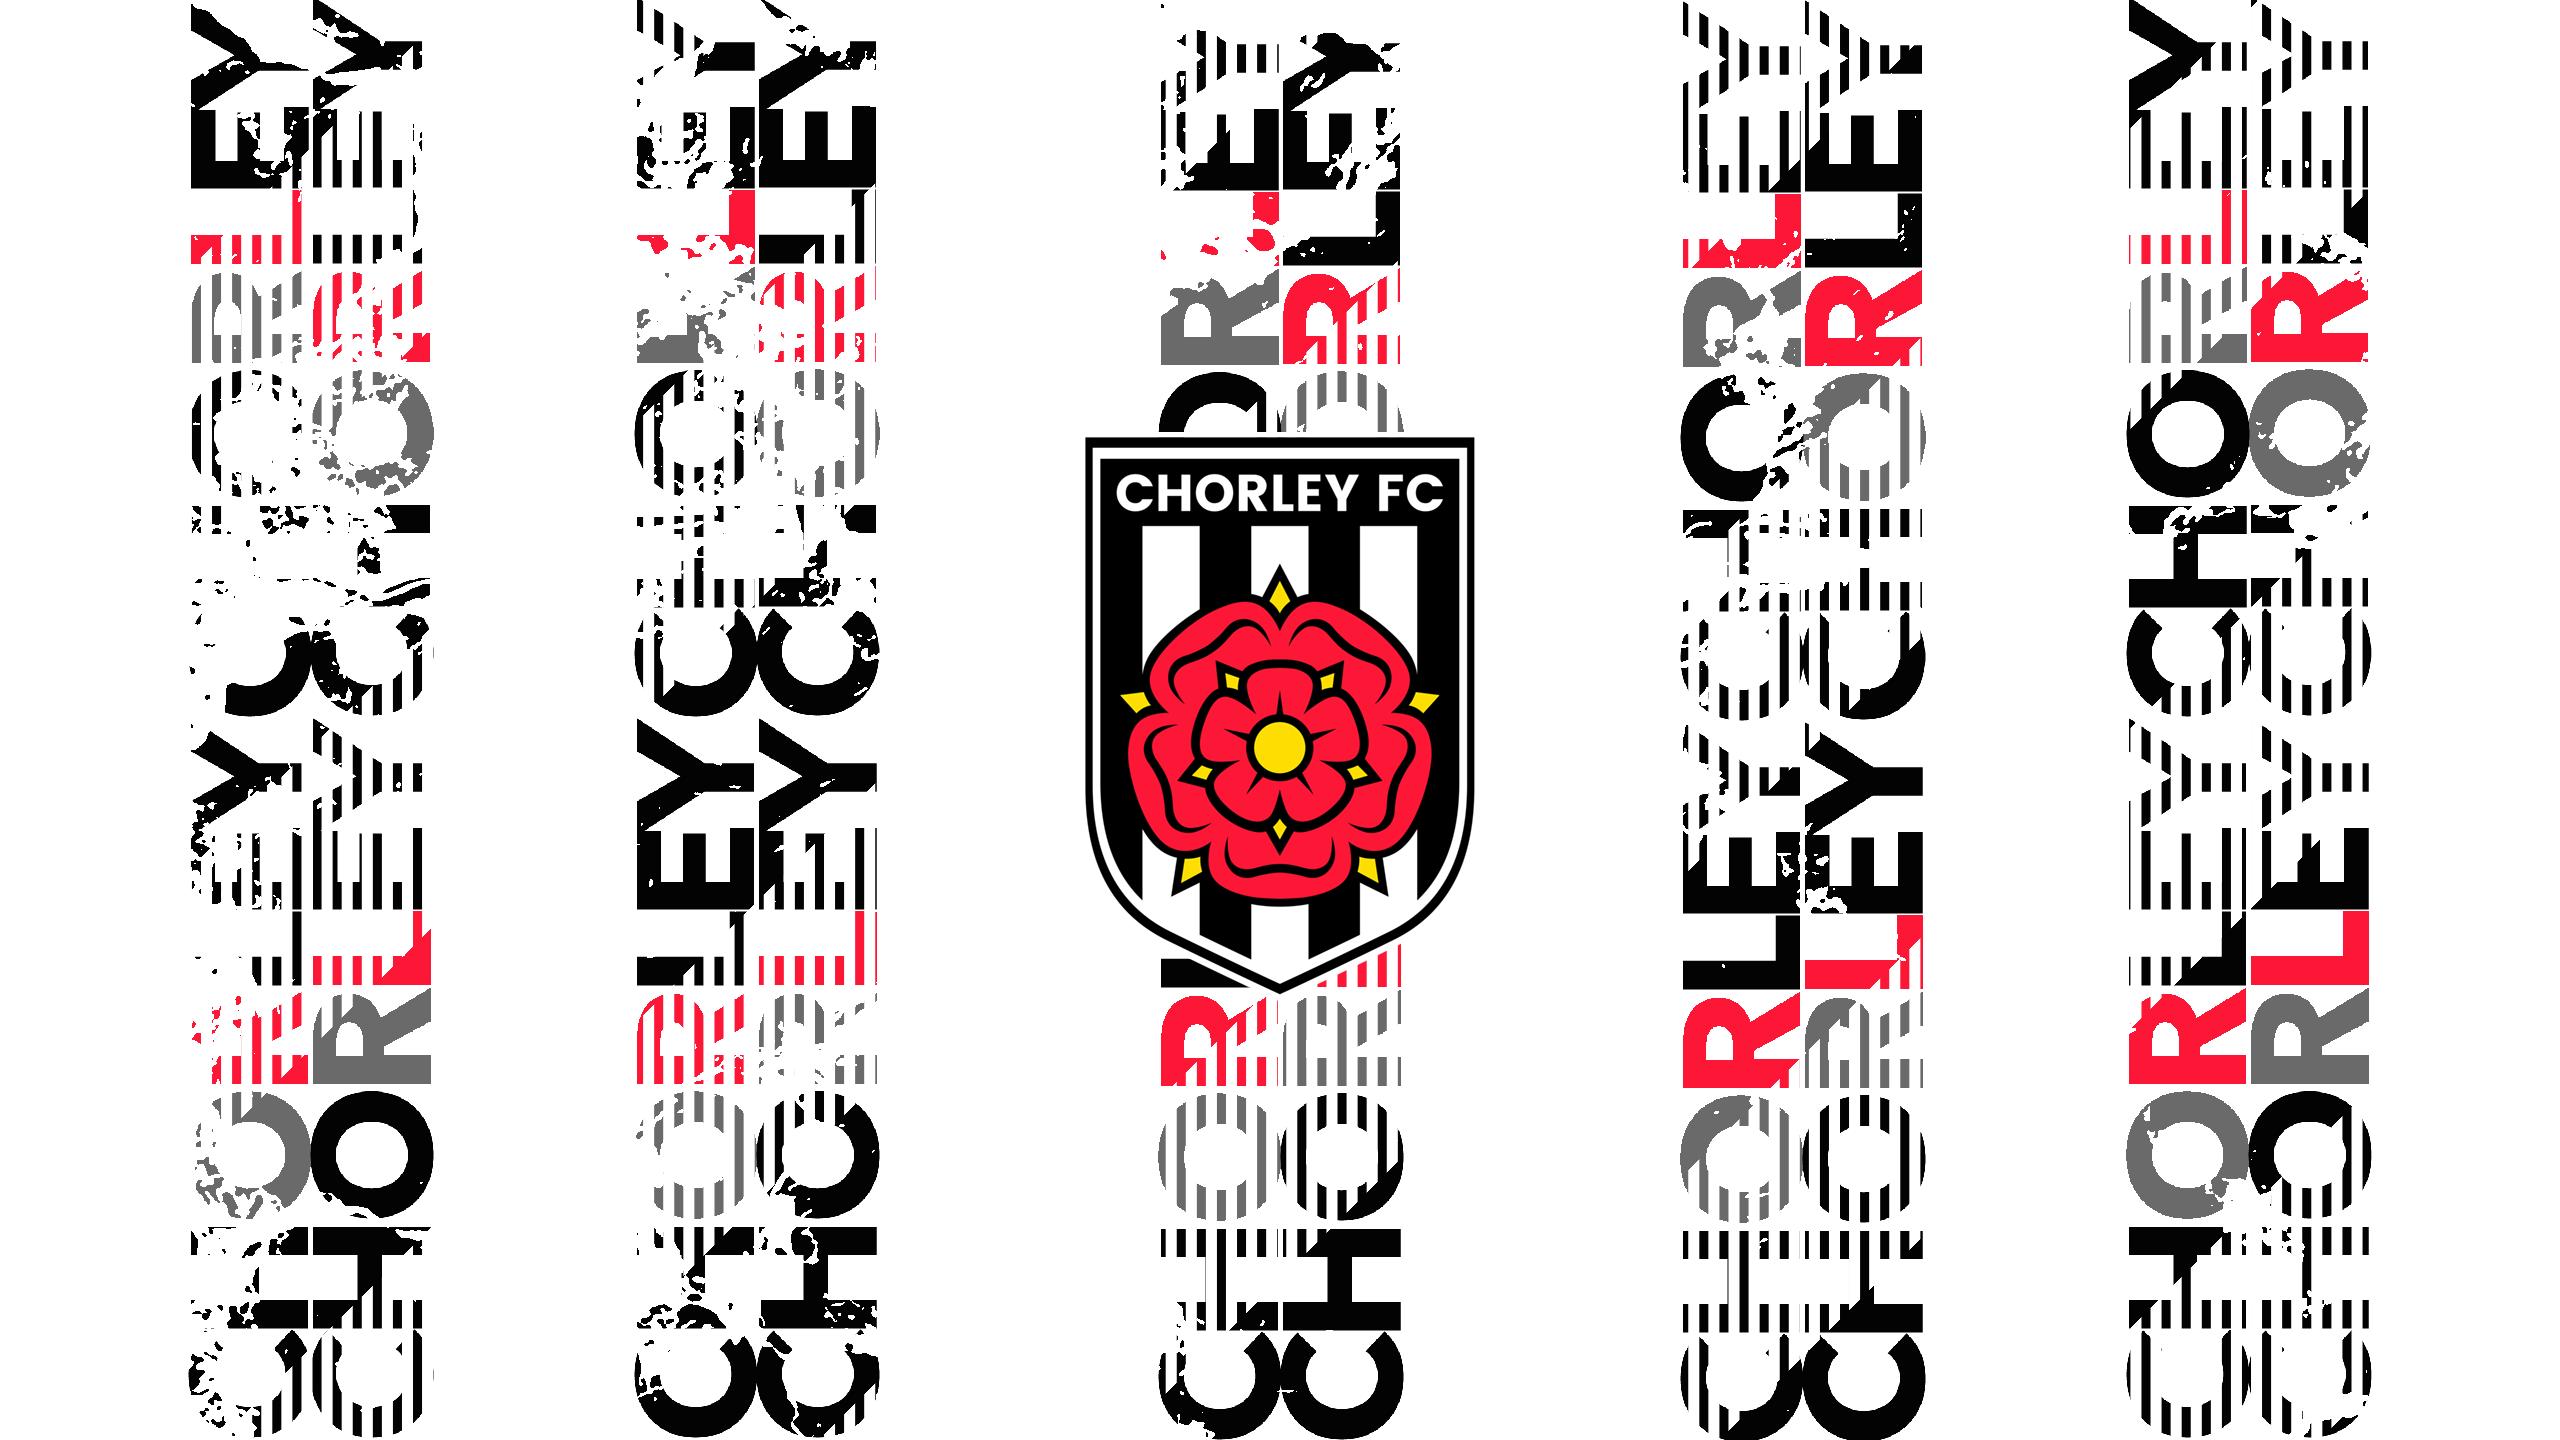 Chorley FC (Third)